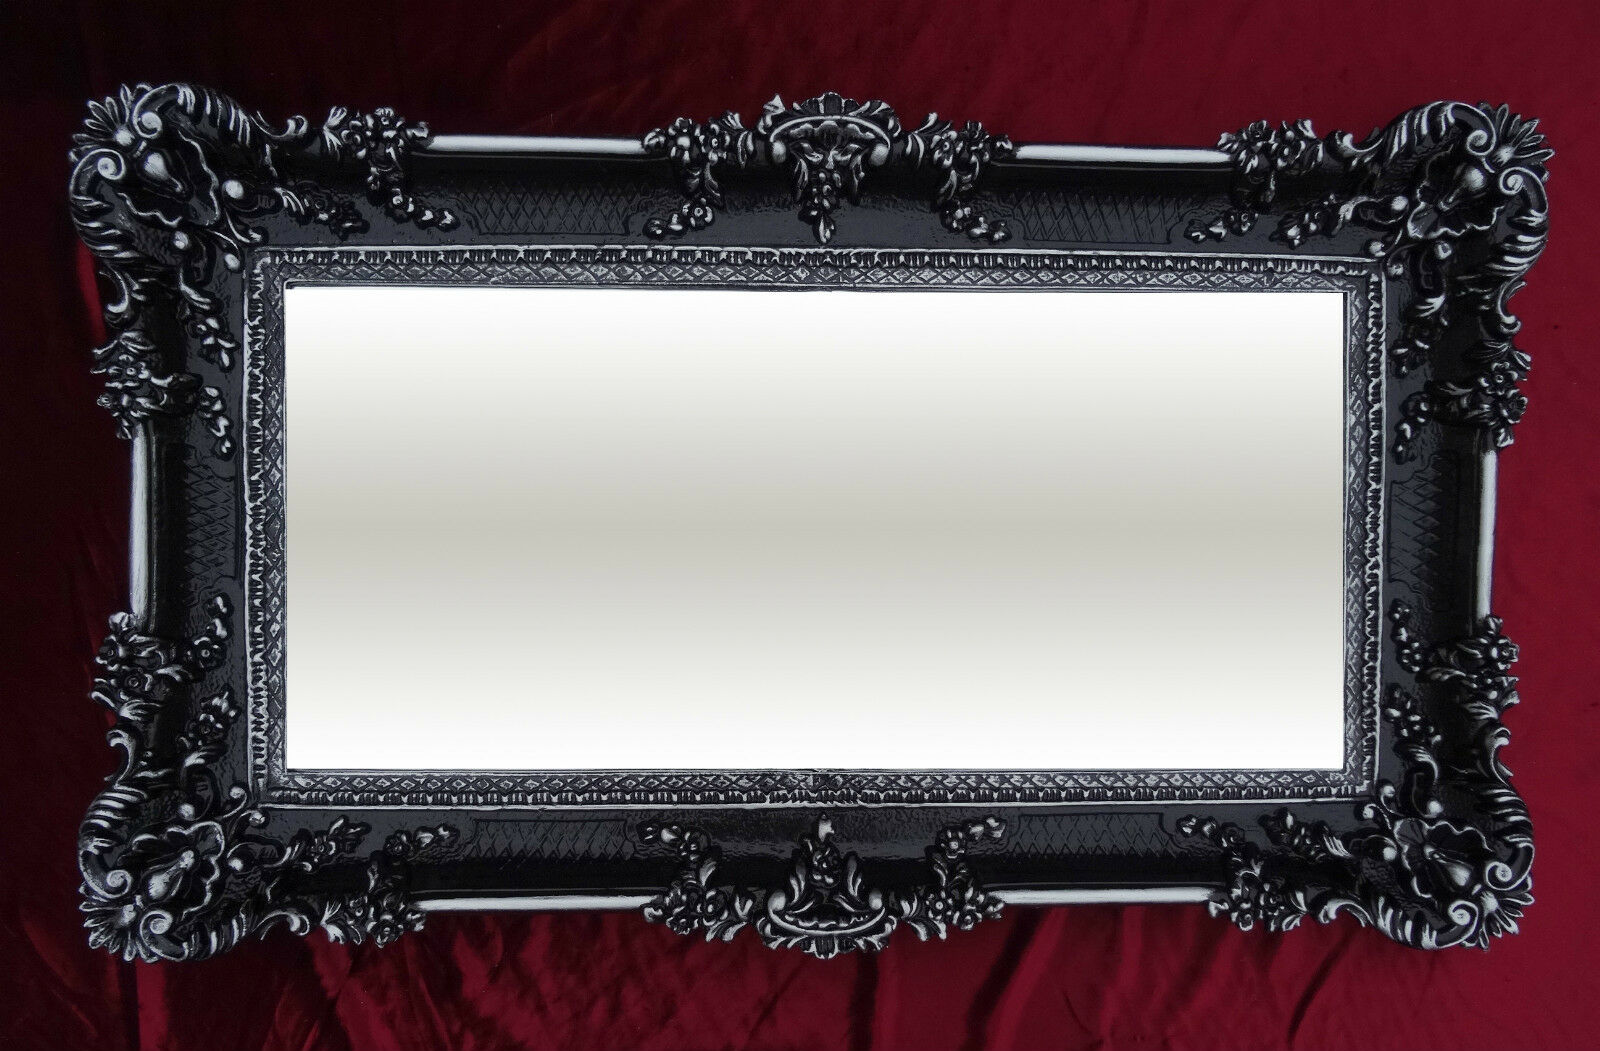 Miroir mural noir argent 96x57 ancien baroque shabby chic - Miroir baroque noir rectangulaire ...